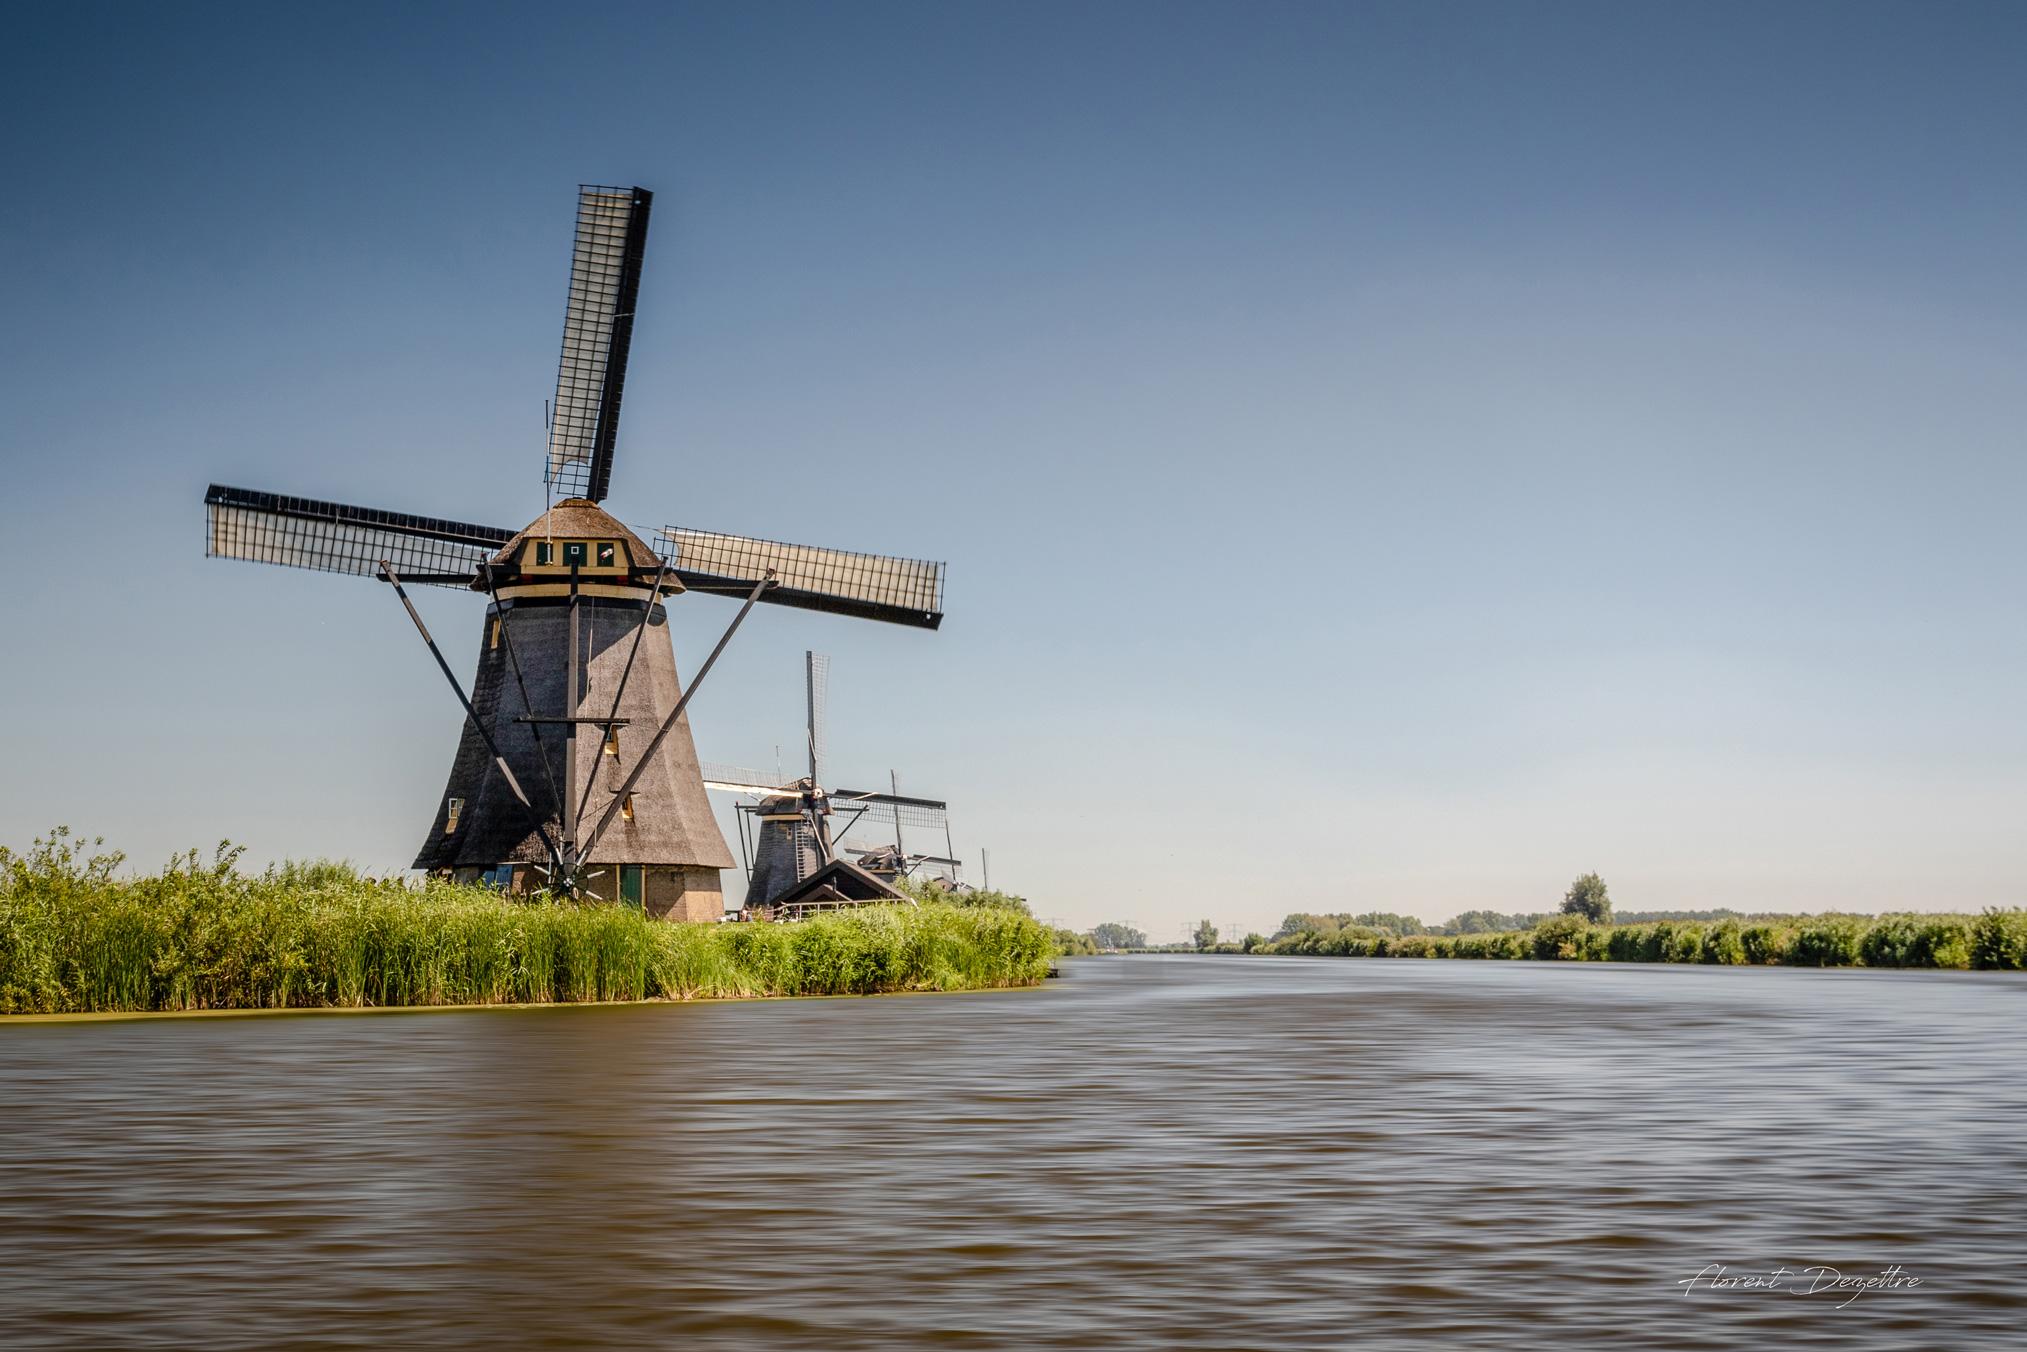 NL_2123-1